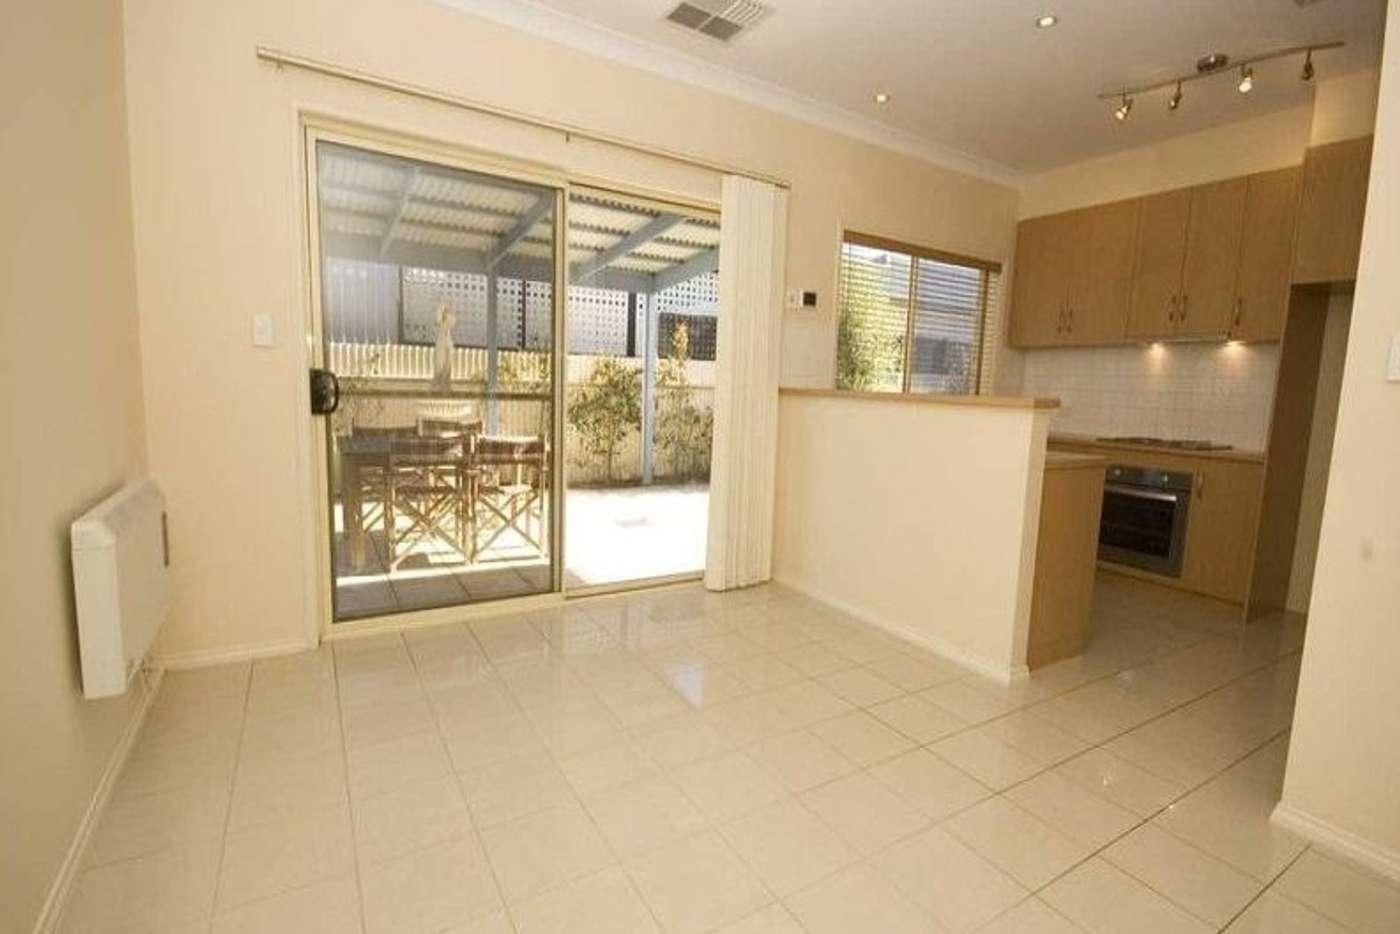 Fifth view of Homely house listing, 27B Prince Street, Alberton SA 5014